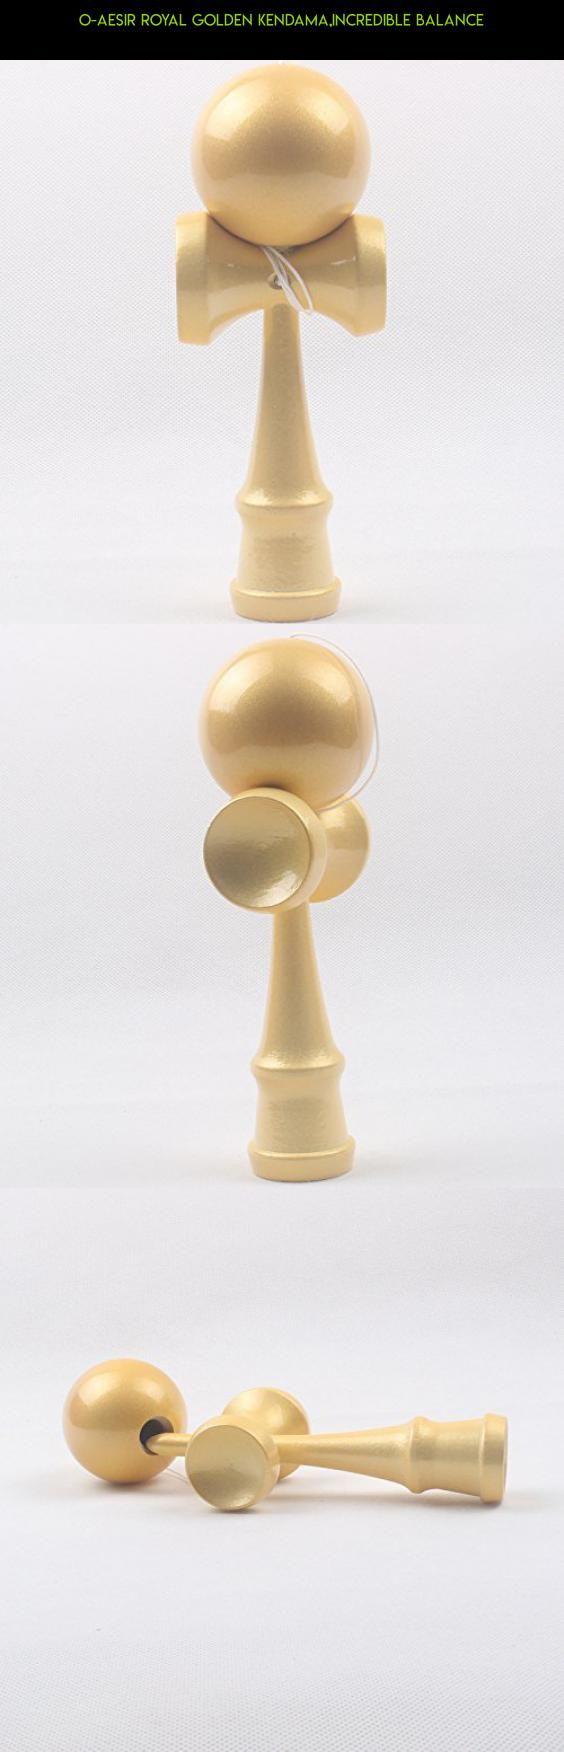 O-Aesir Royal Golden Kendama,Incredible Balance #plans #kendama #fpv #shopping #products #racing #drone #technology #tech #gadgets #kit #camera #parts #gold